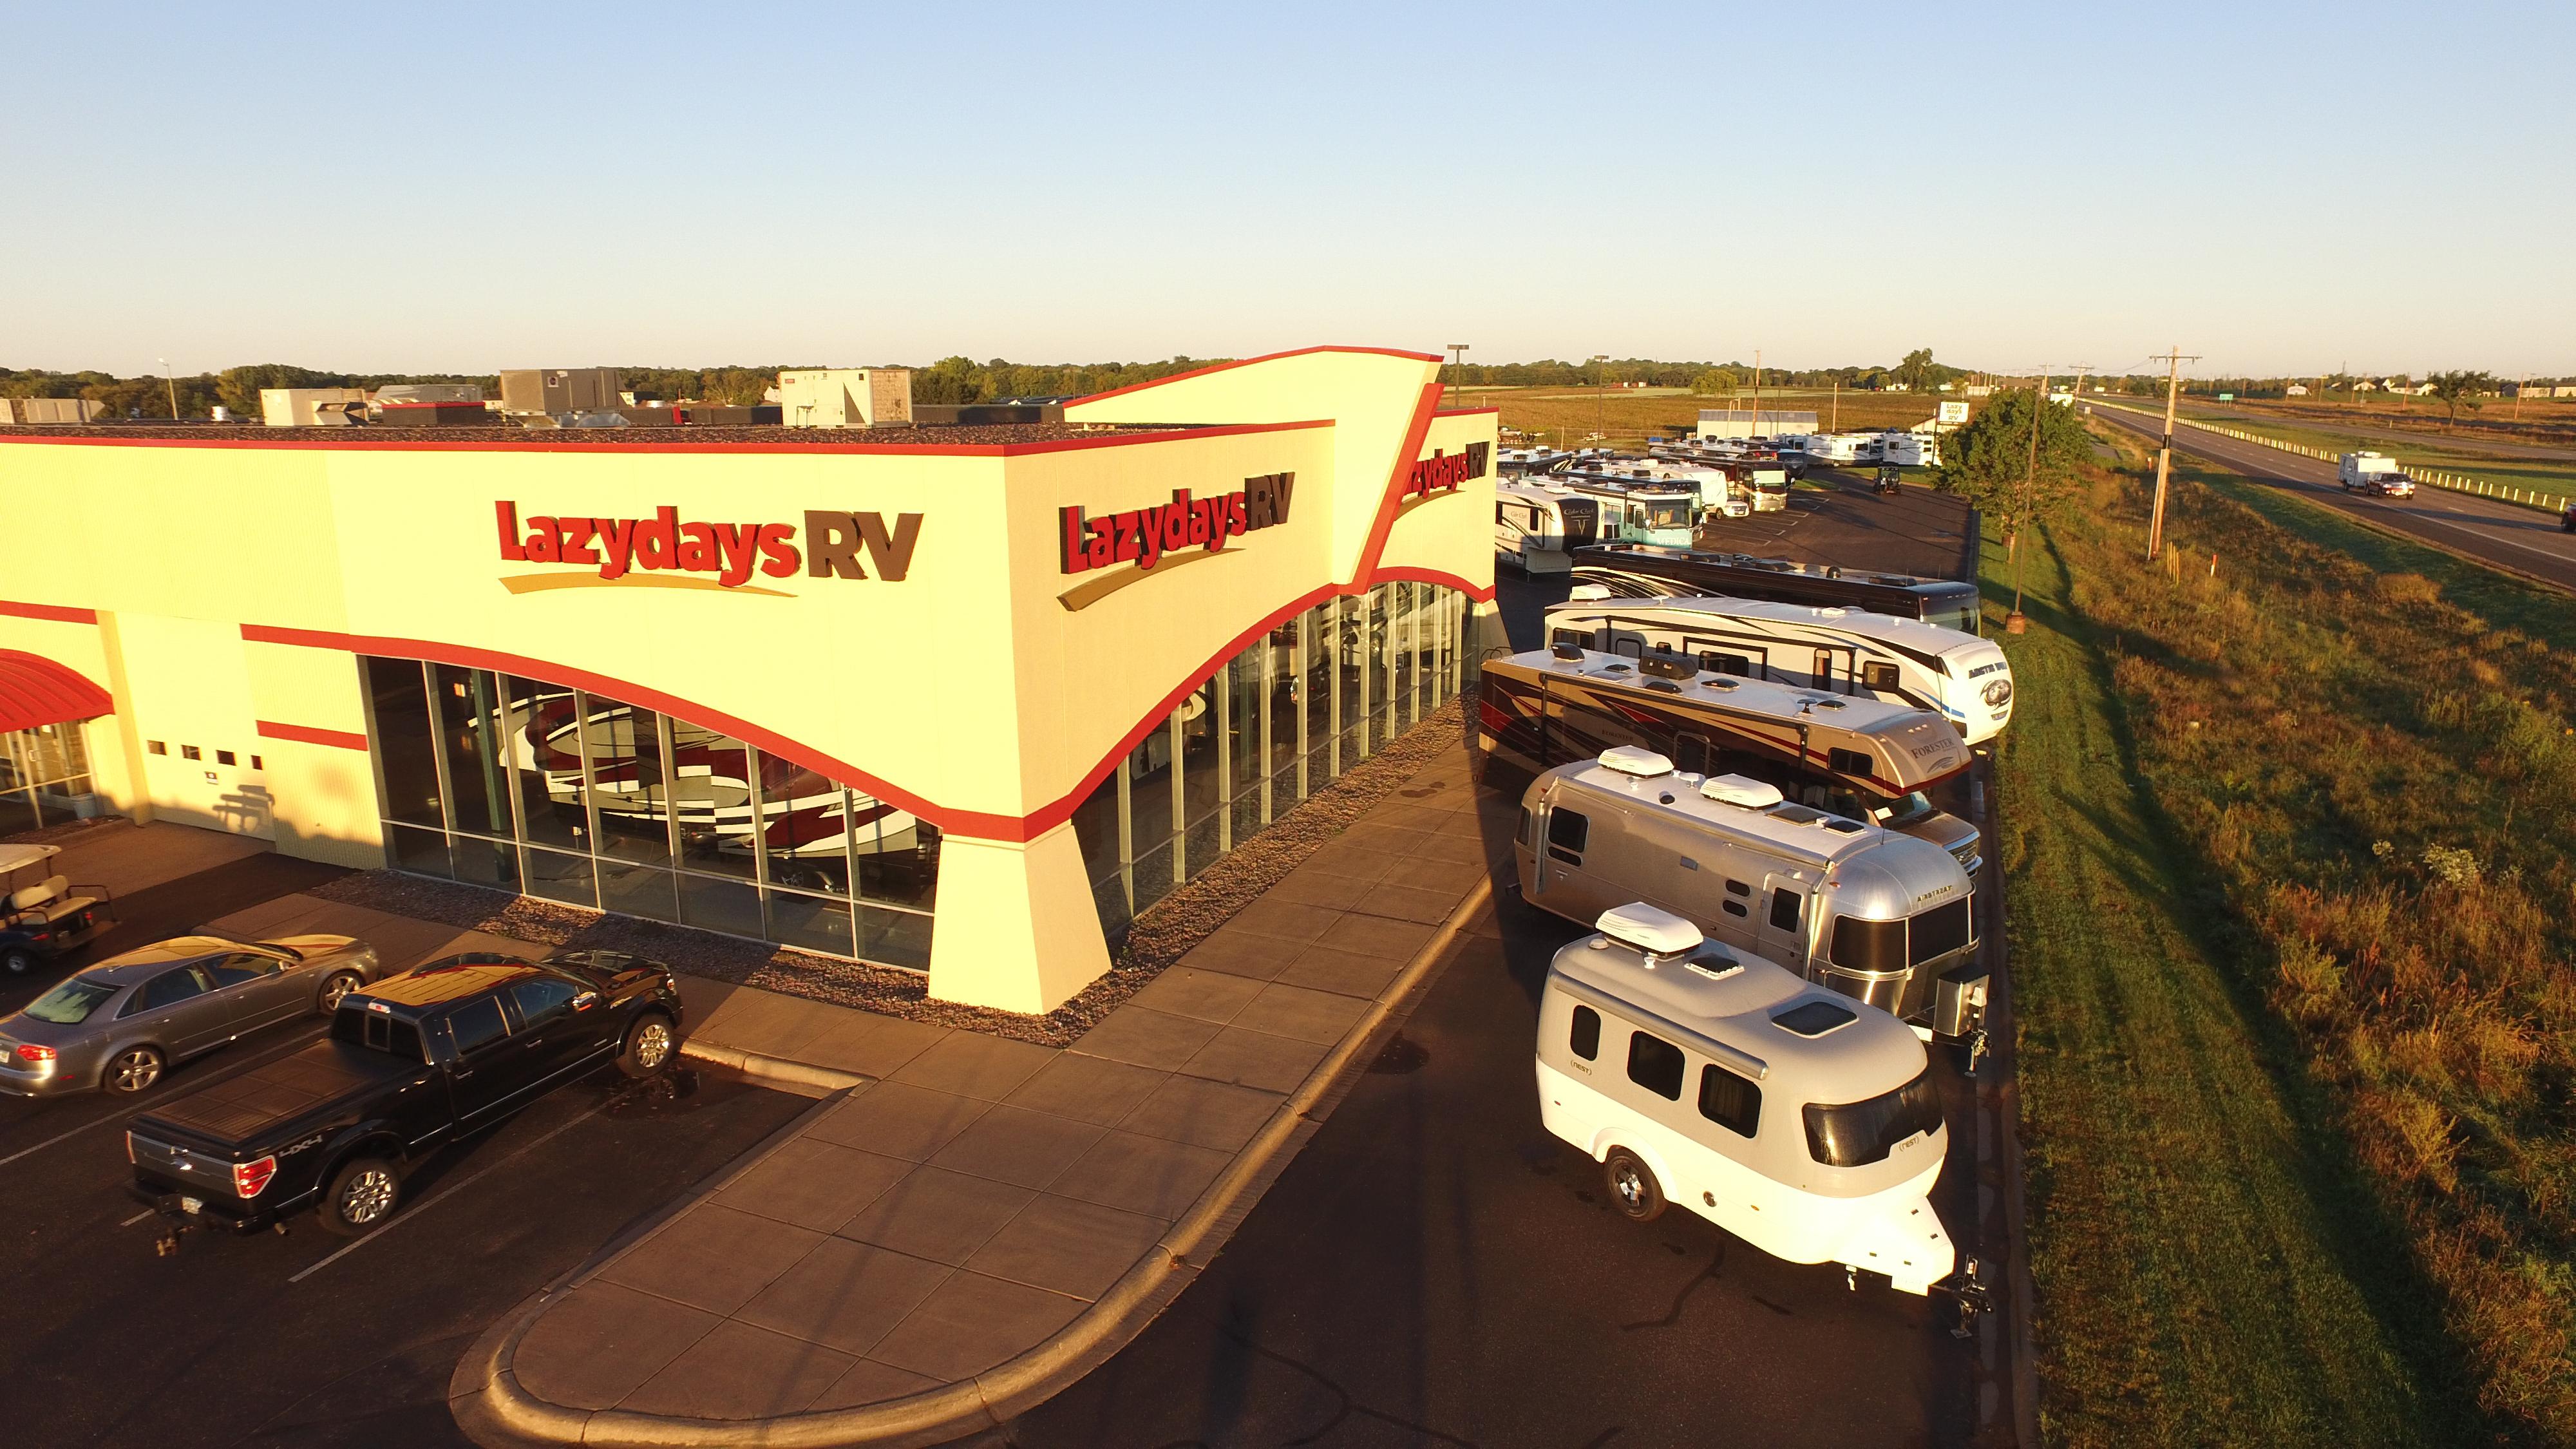 Lazydays RV Minneapolis